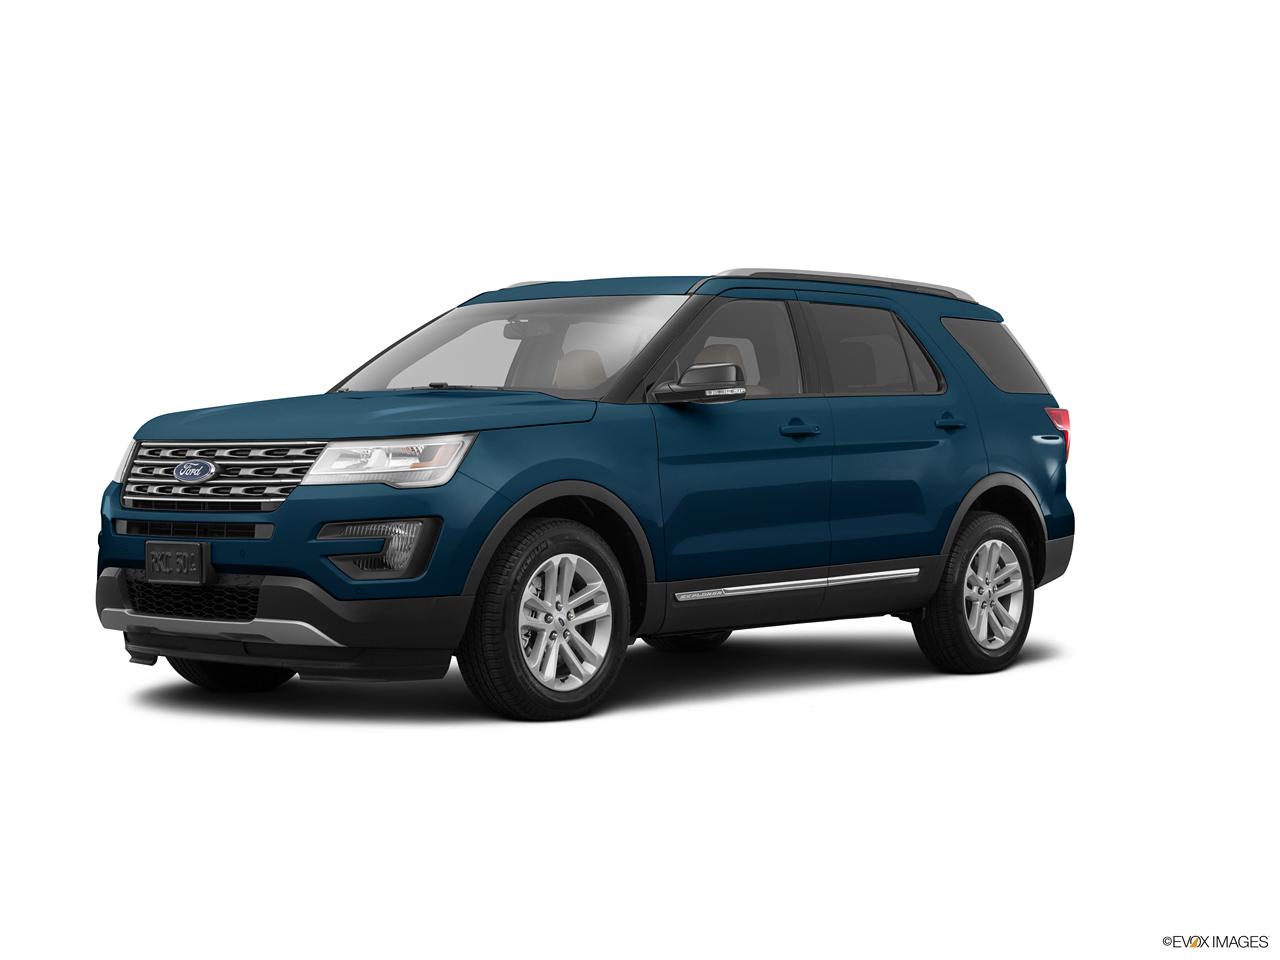 ford explorer 2017 3 5l v6 xlt awd in saudi arabia new car prices specs reviews photos. Black Bedroom Furniture Sets. Home Design Ideas